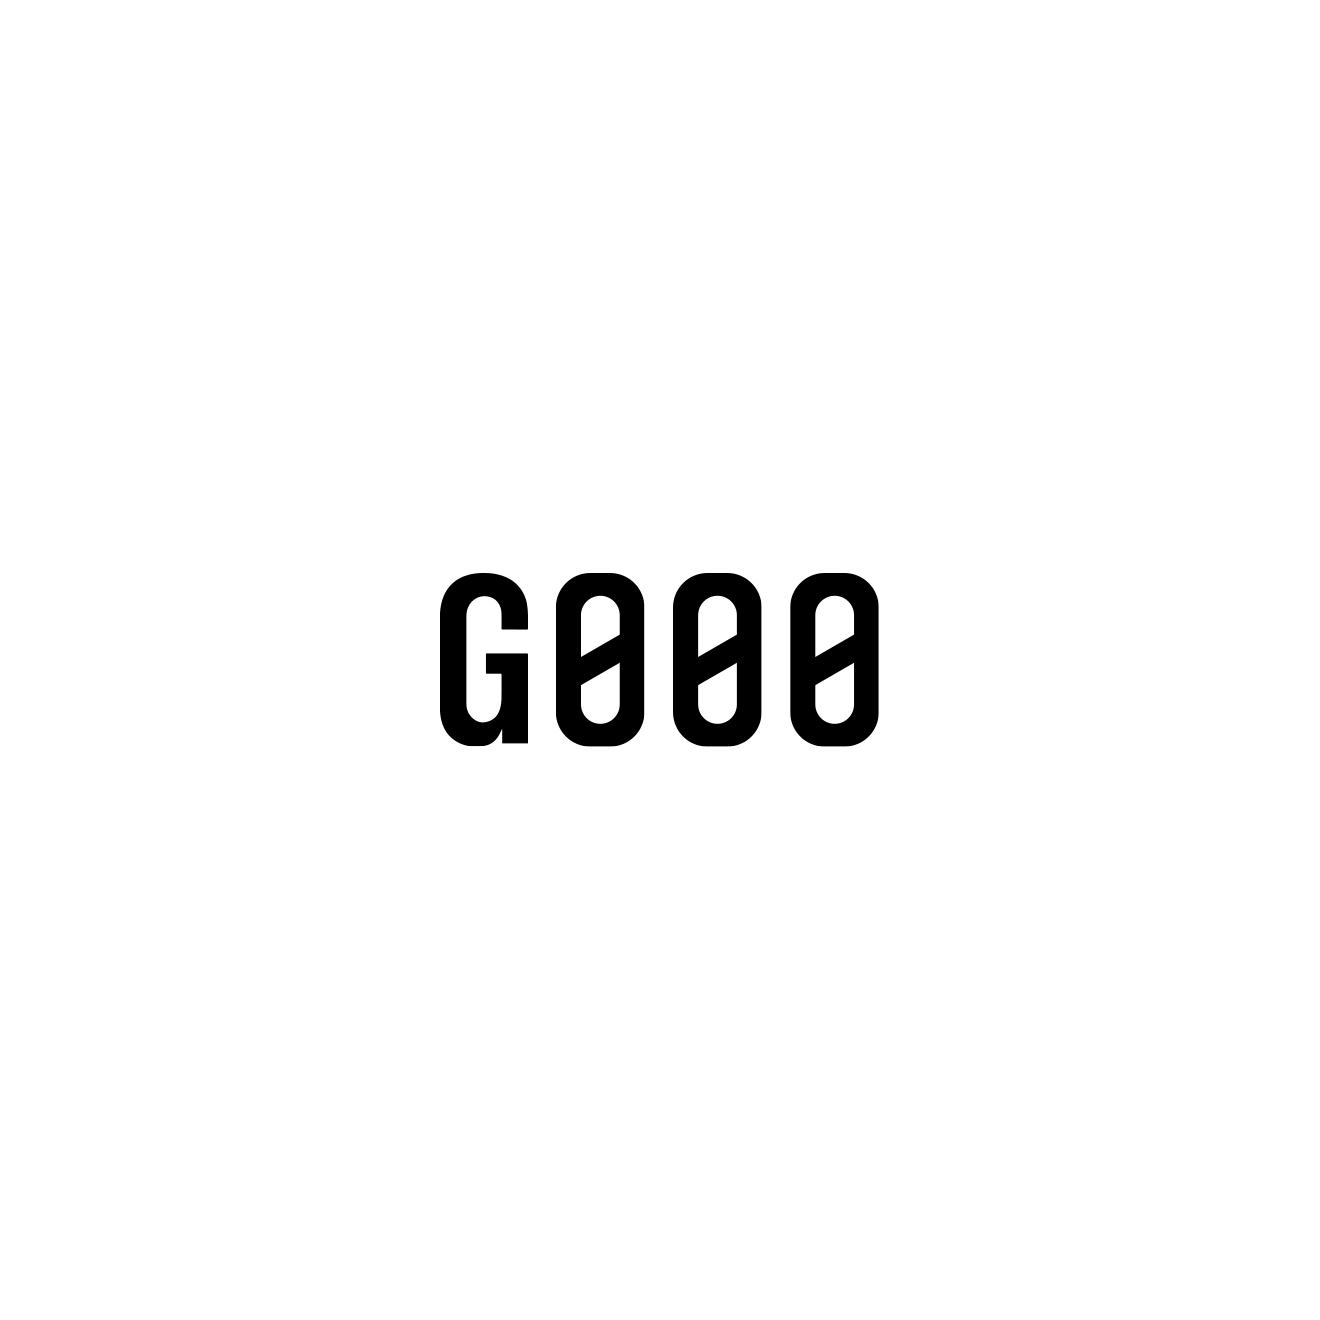 logo-gooo